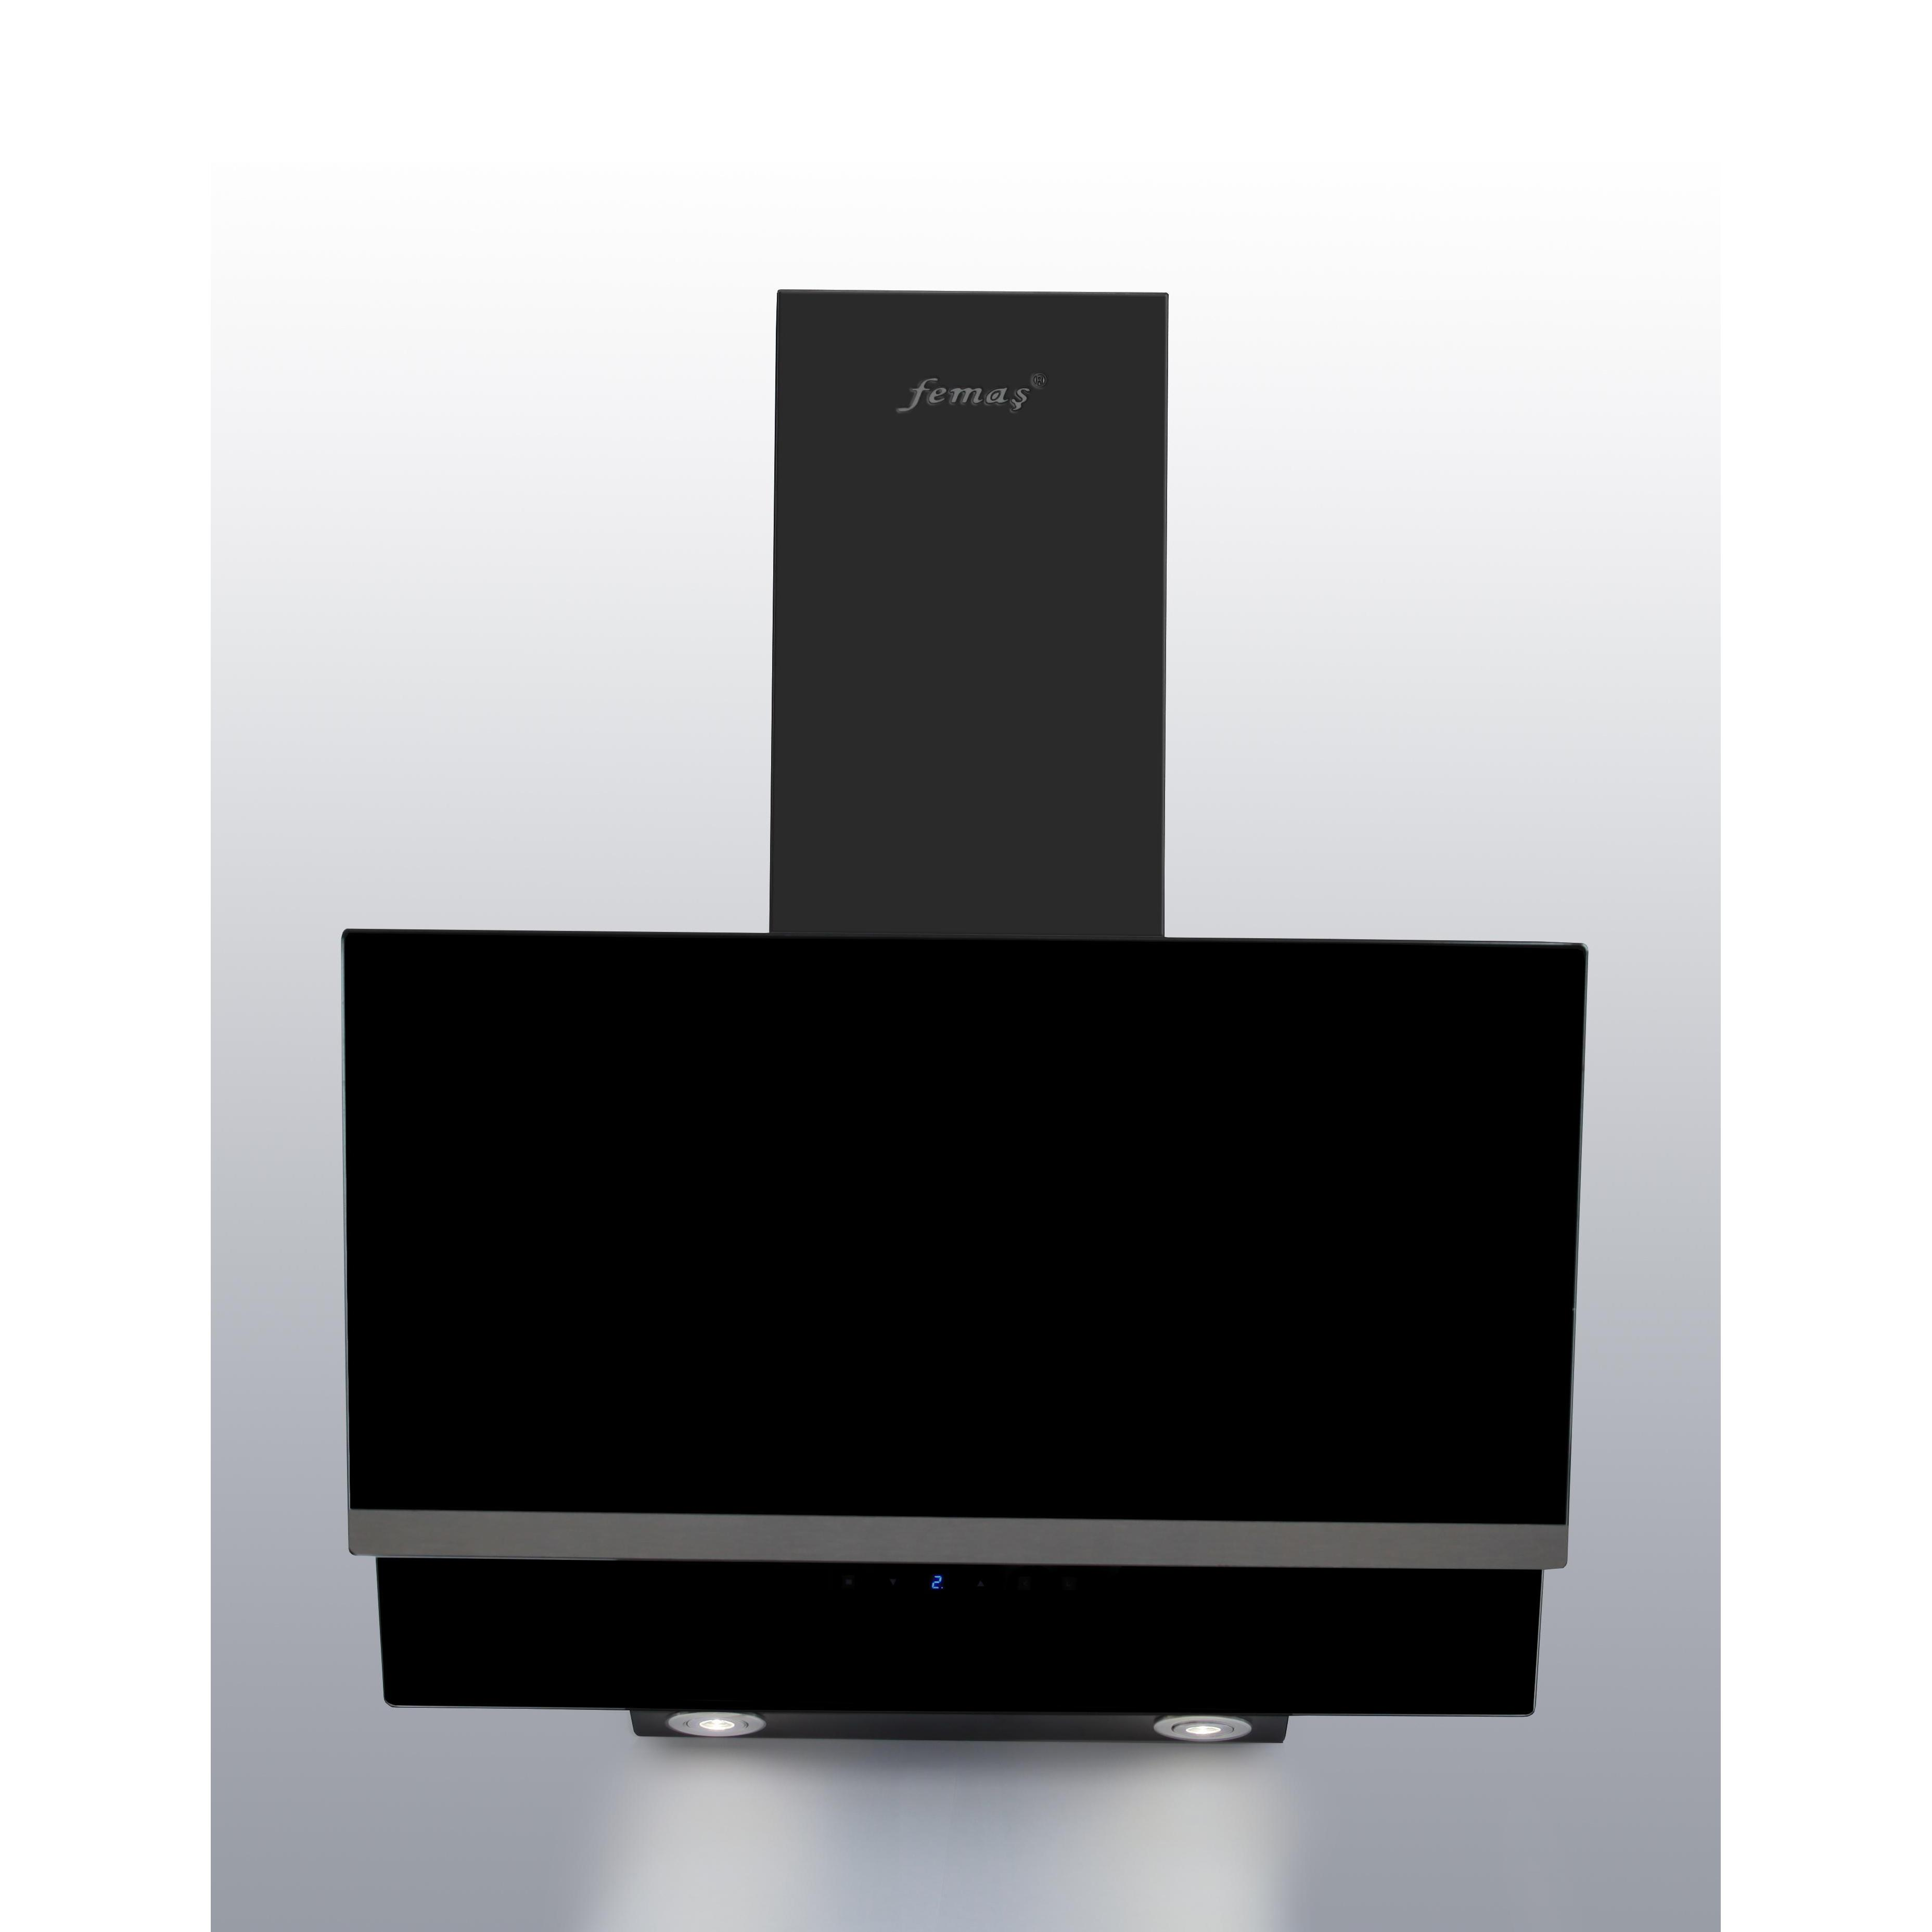 hotte aspirante vitre noir 60 cm sim. Black Bedroom Furniture Sets. Home Design Ideas